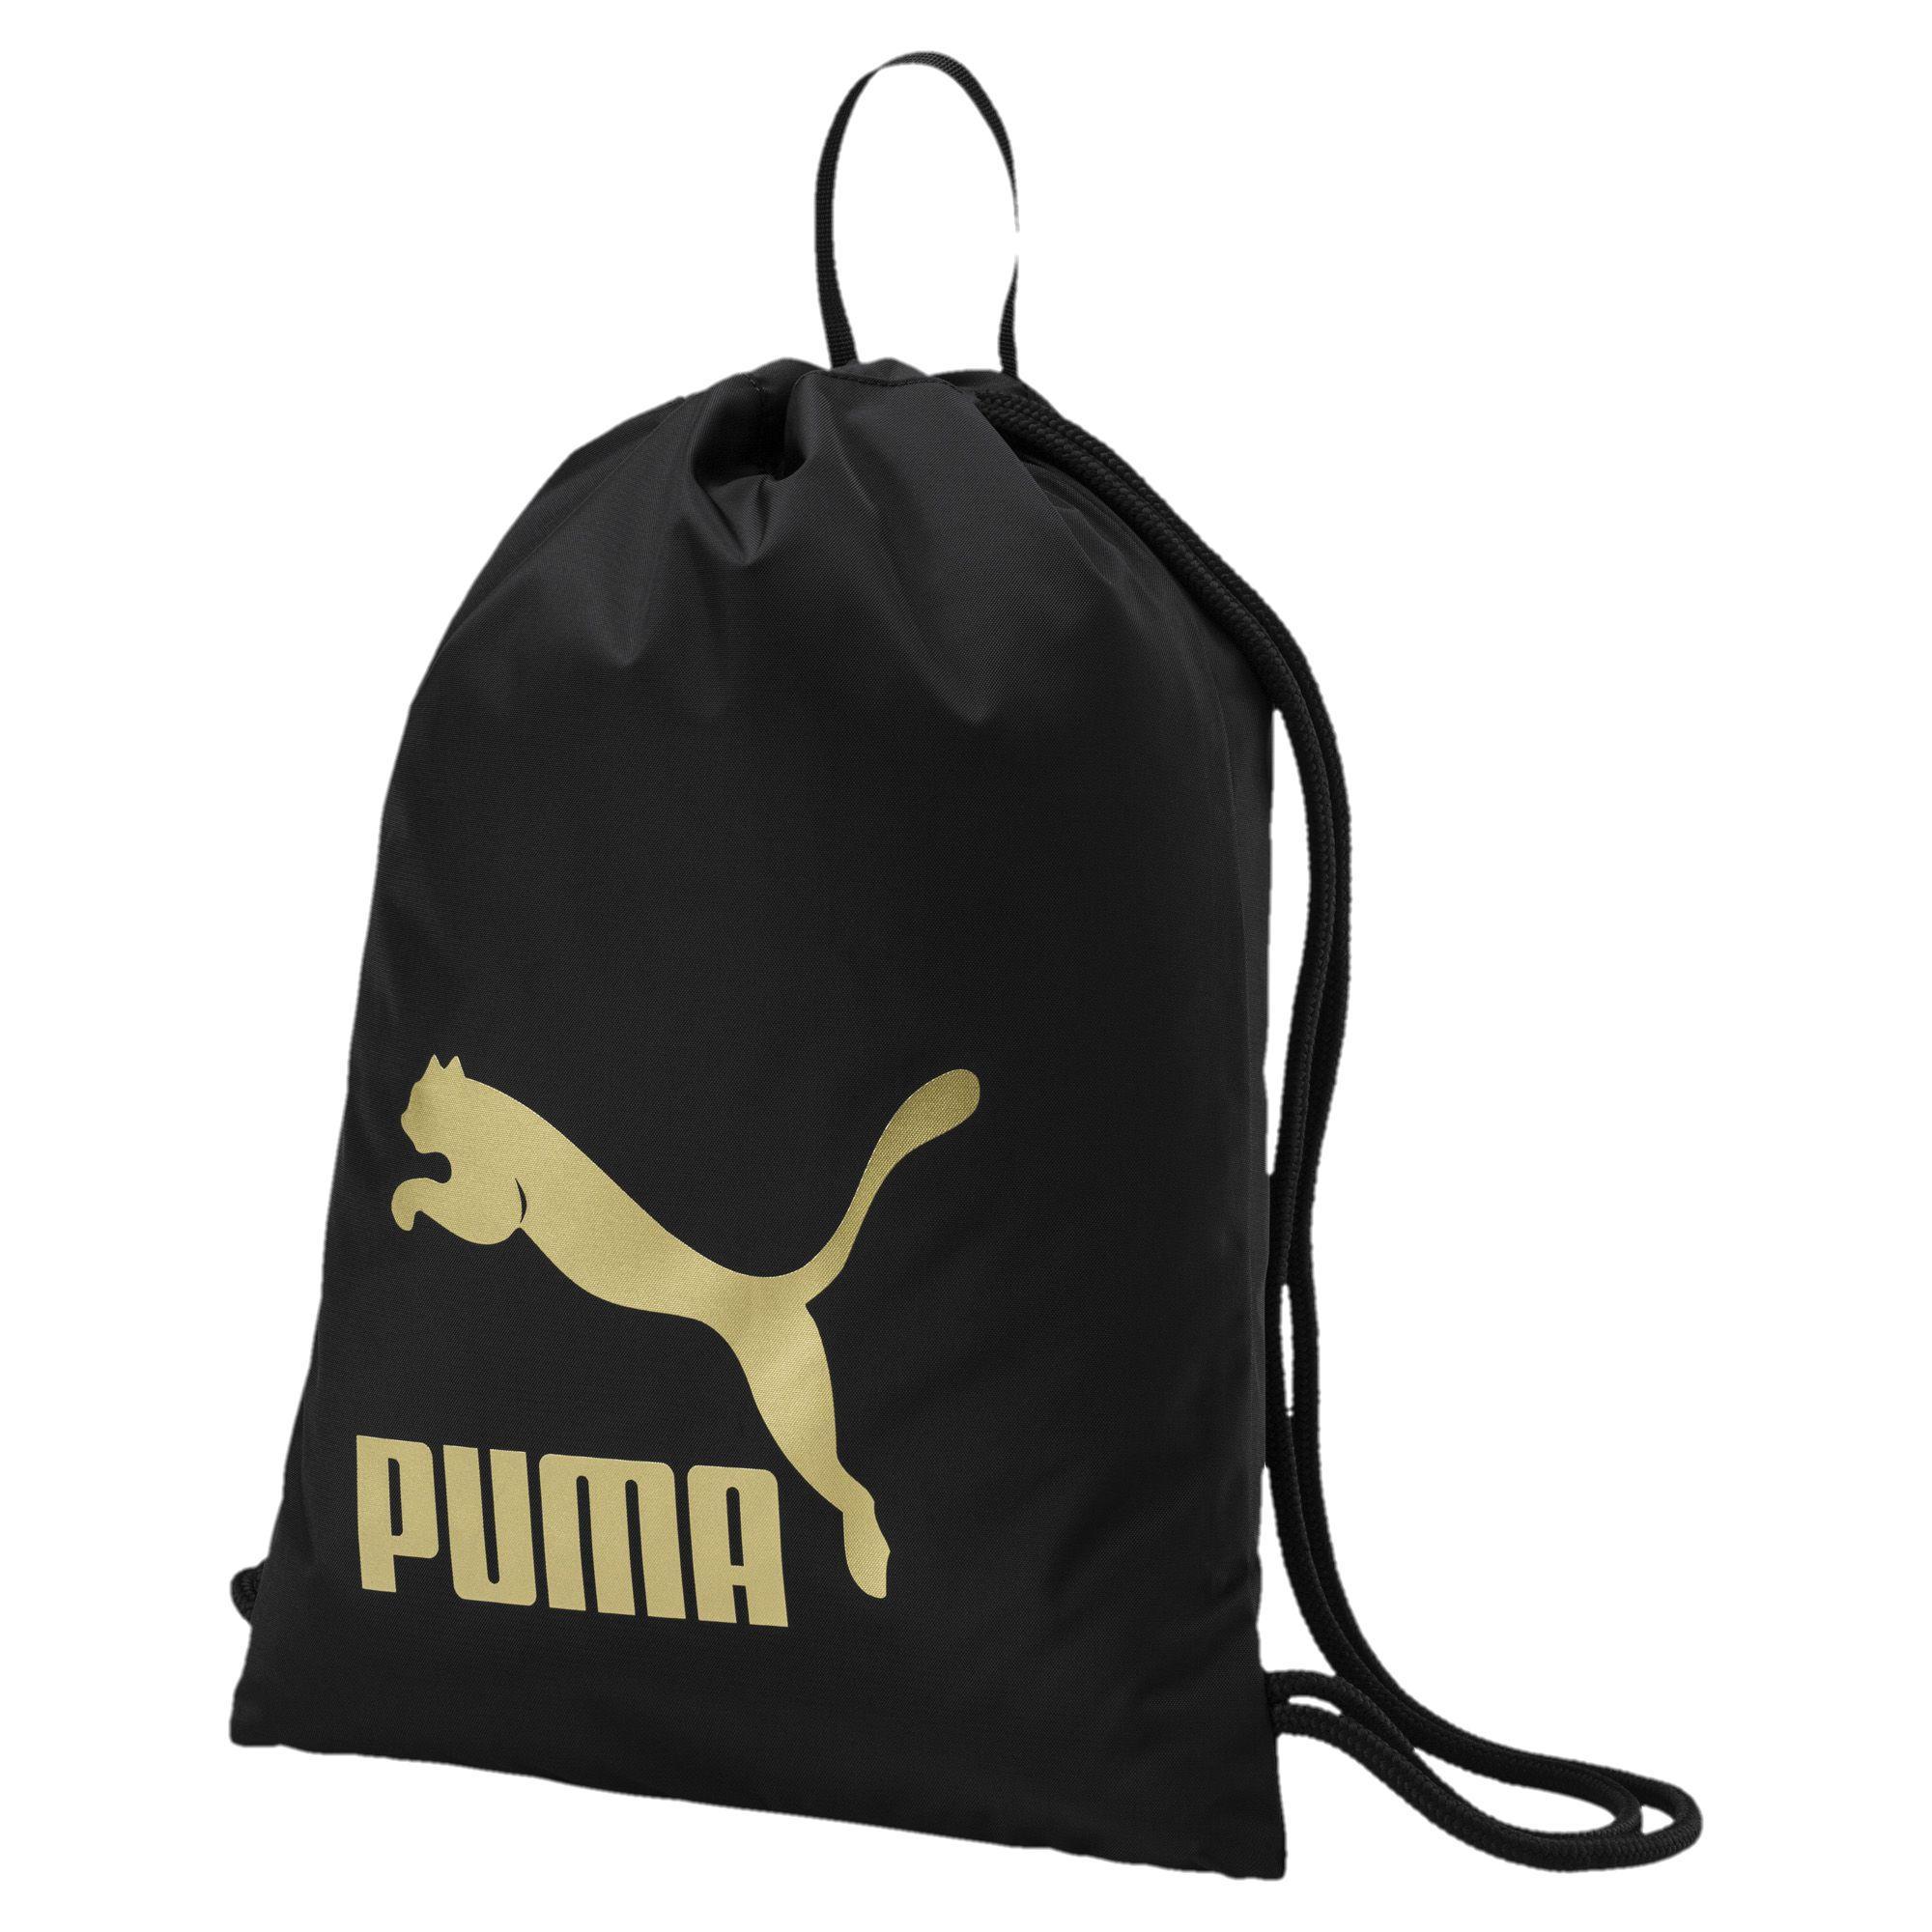 Puma Tas Gymsack Originals - 07481209 - Hitam By Sarangsepatu.